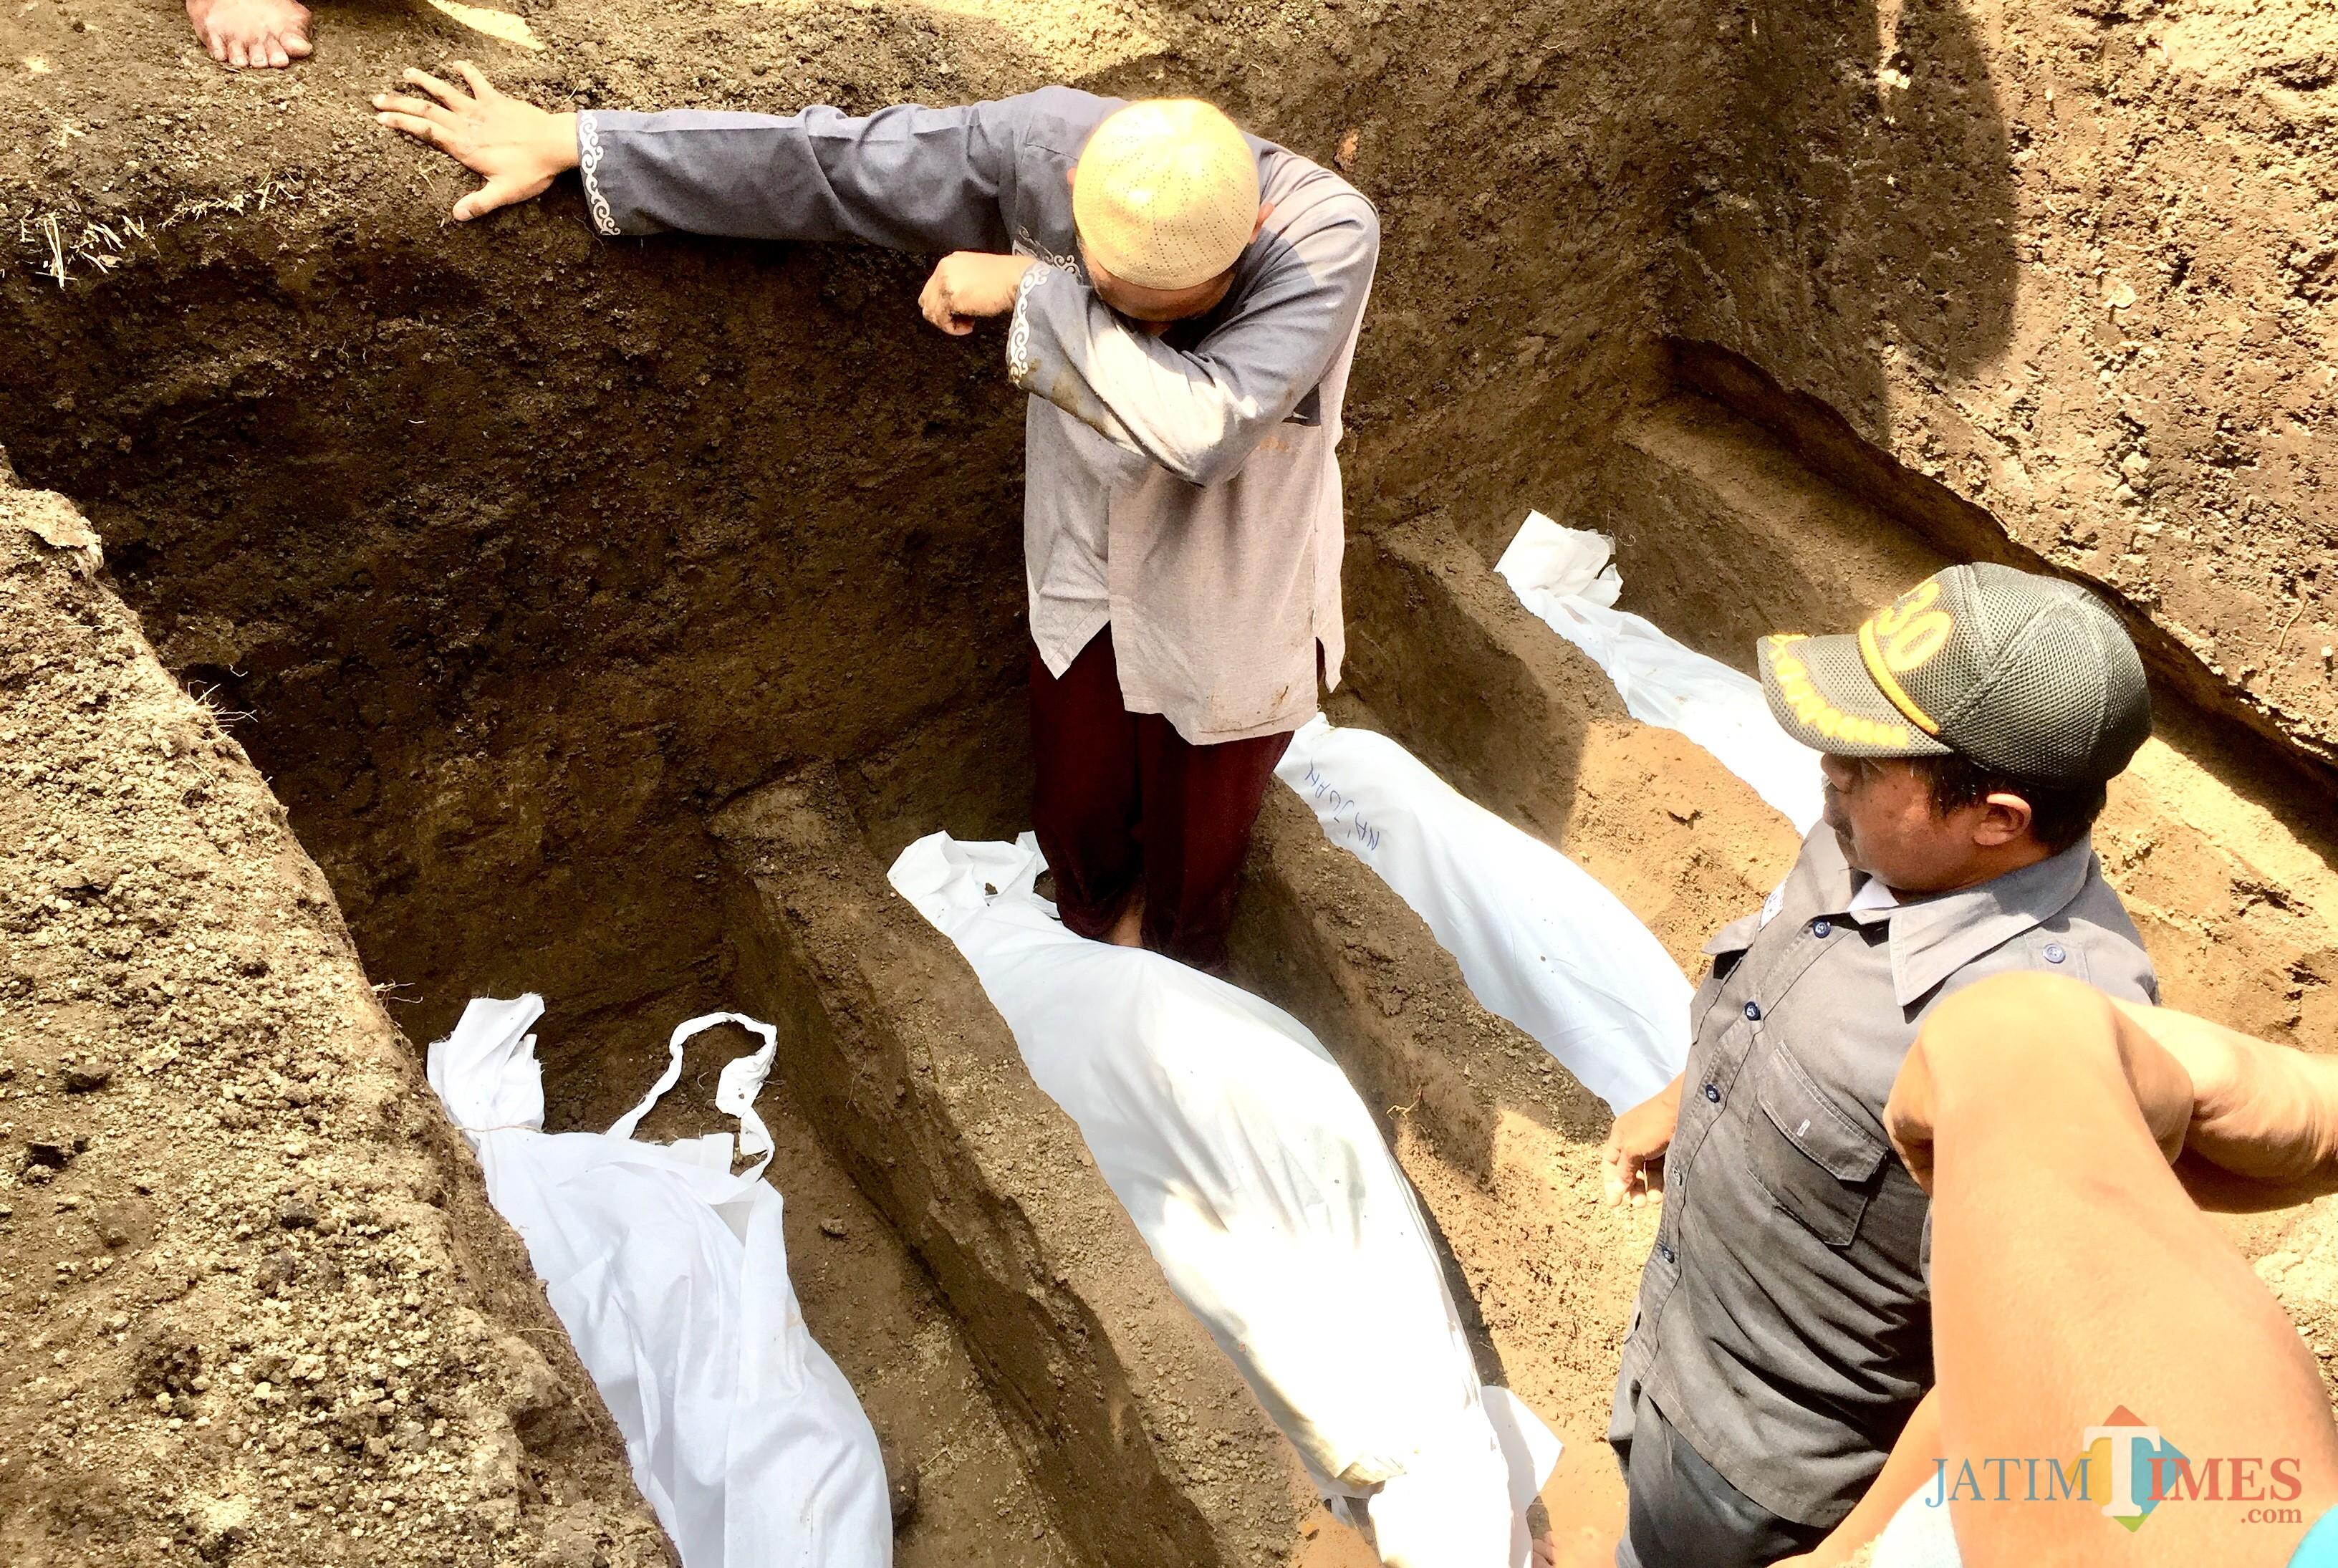 Prosesi pemakaman 4 anak jenazah kebakaran di TPUDesa Junrejo, Kecamatan Junrejo, Kota Batu, Rabu (24/7/2019). (Foto: Irsya Richa/MalangTIMES)